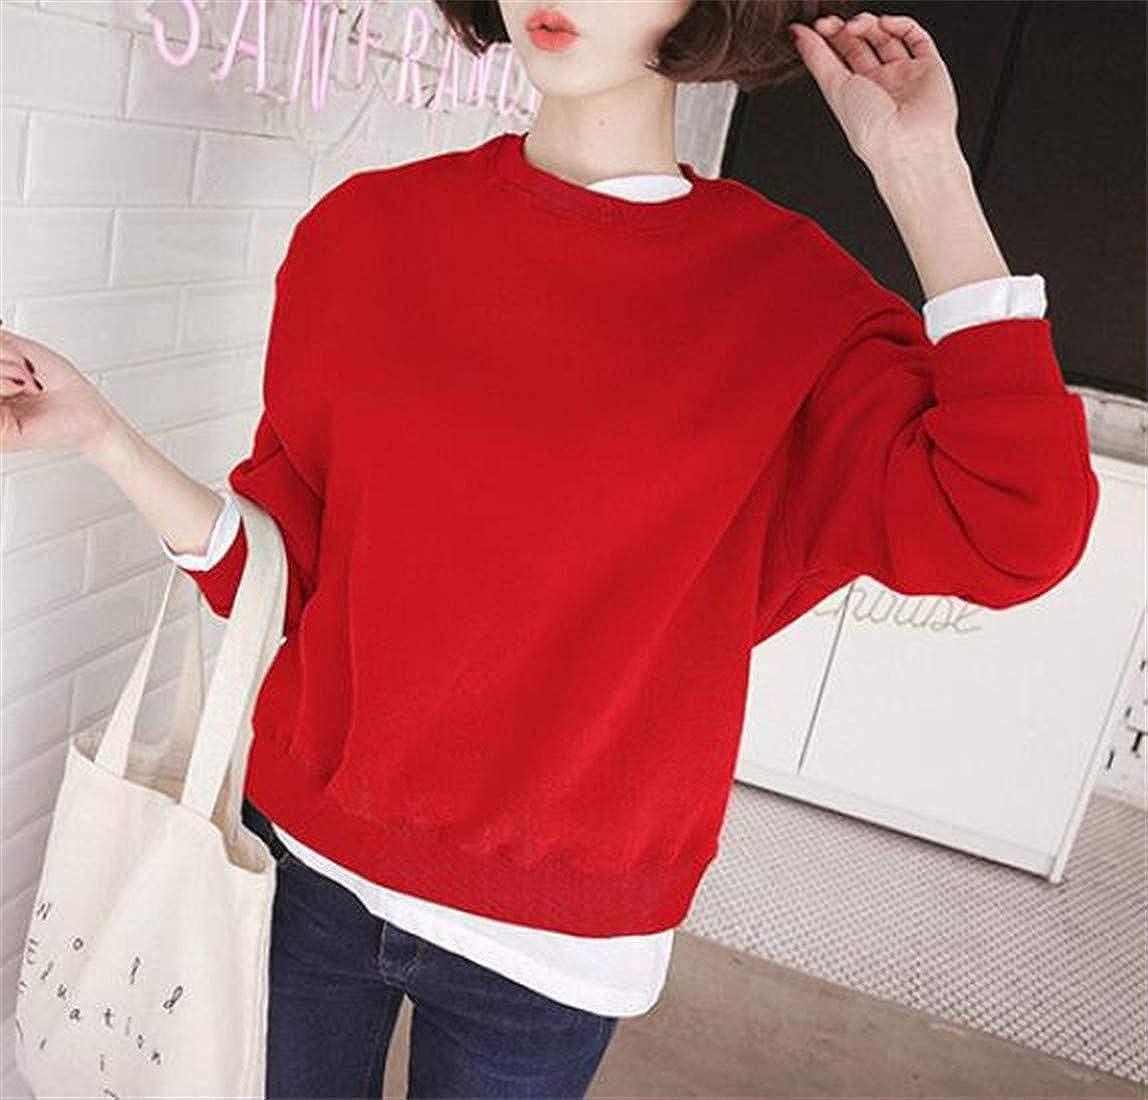 Joe Wenko Womens Pullover Simple Pure Color Loose Round-Neck Coat Sweatshirts